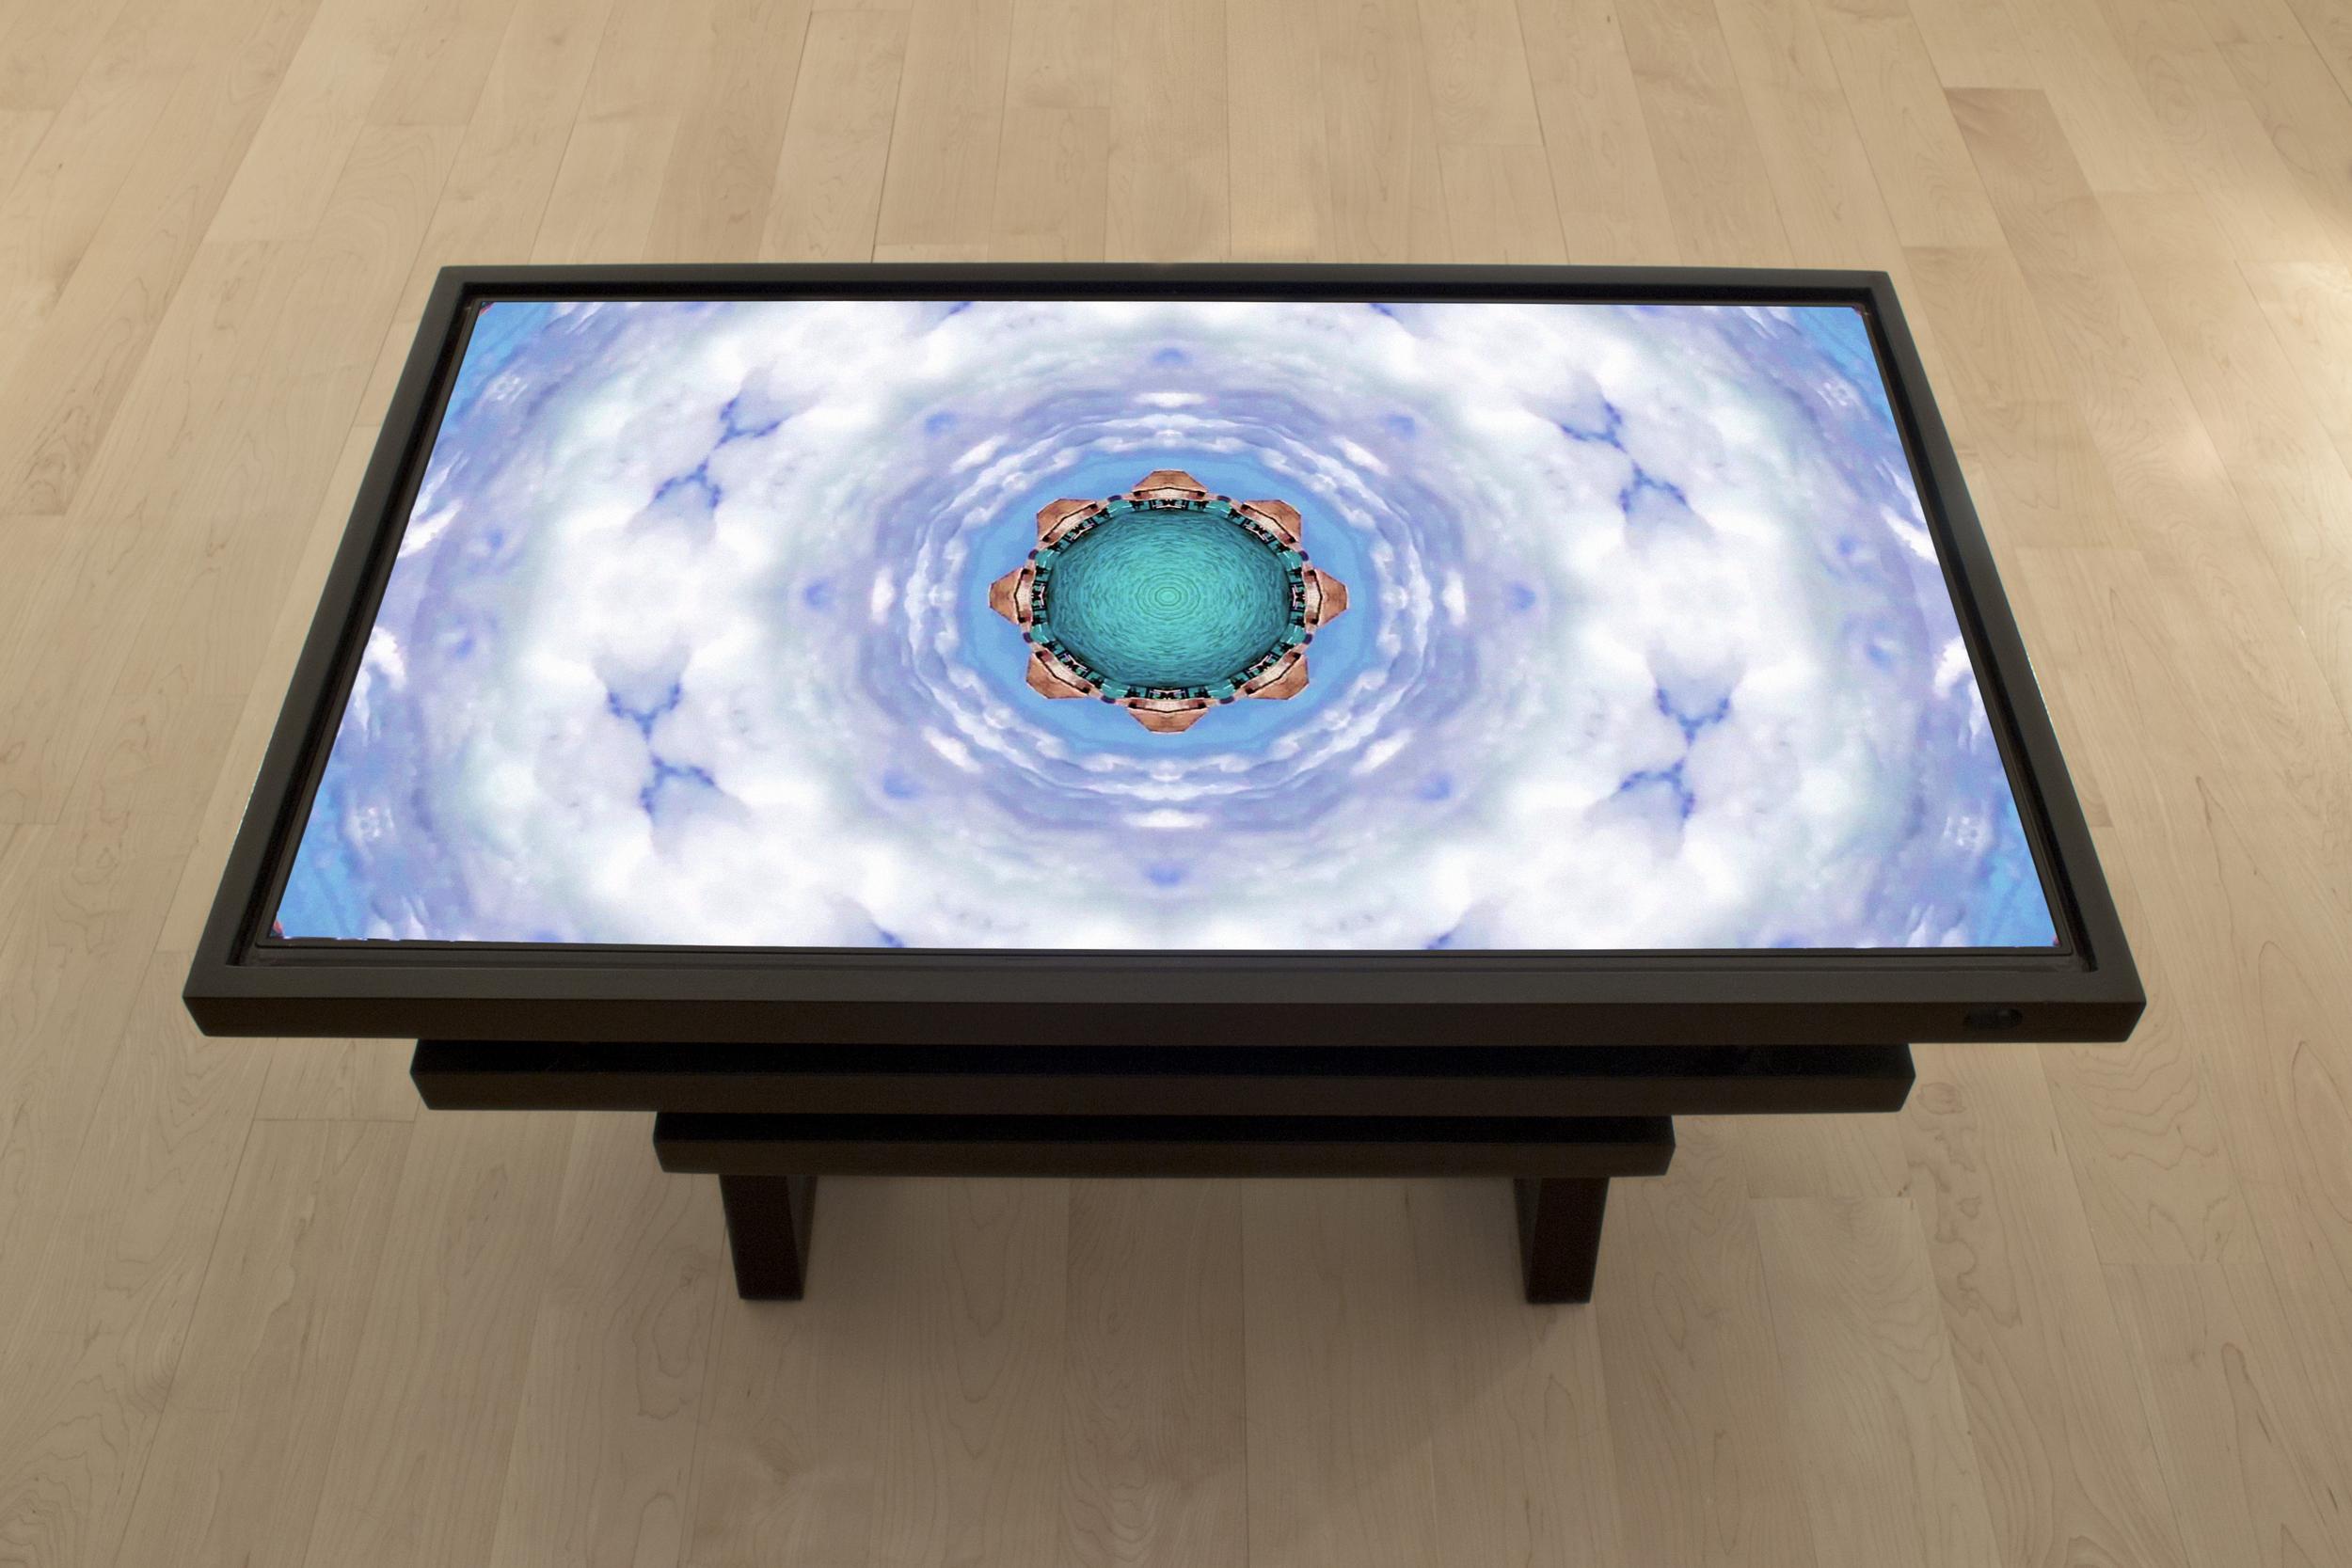 Ann Spalter  Topio (Video Table), Bora Bora: Lagoon, 1080p HD digital video, 3min. 2013